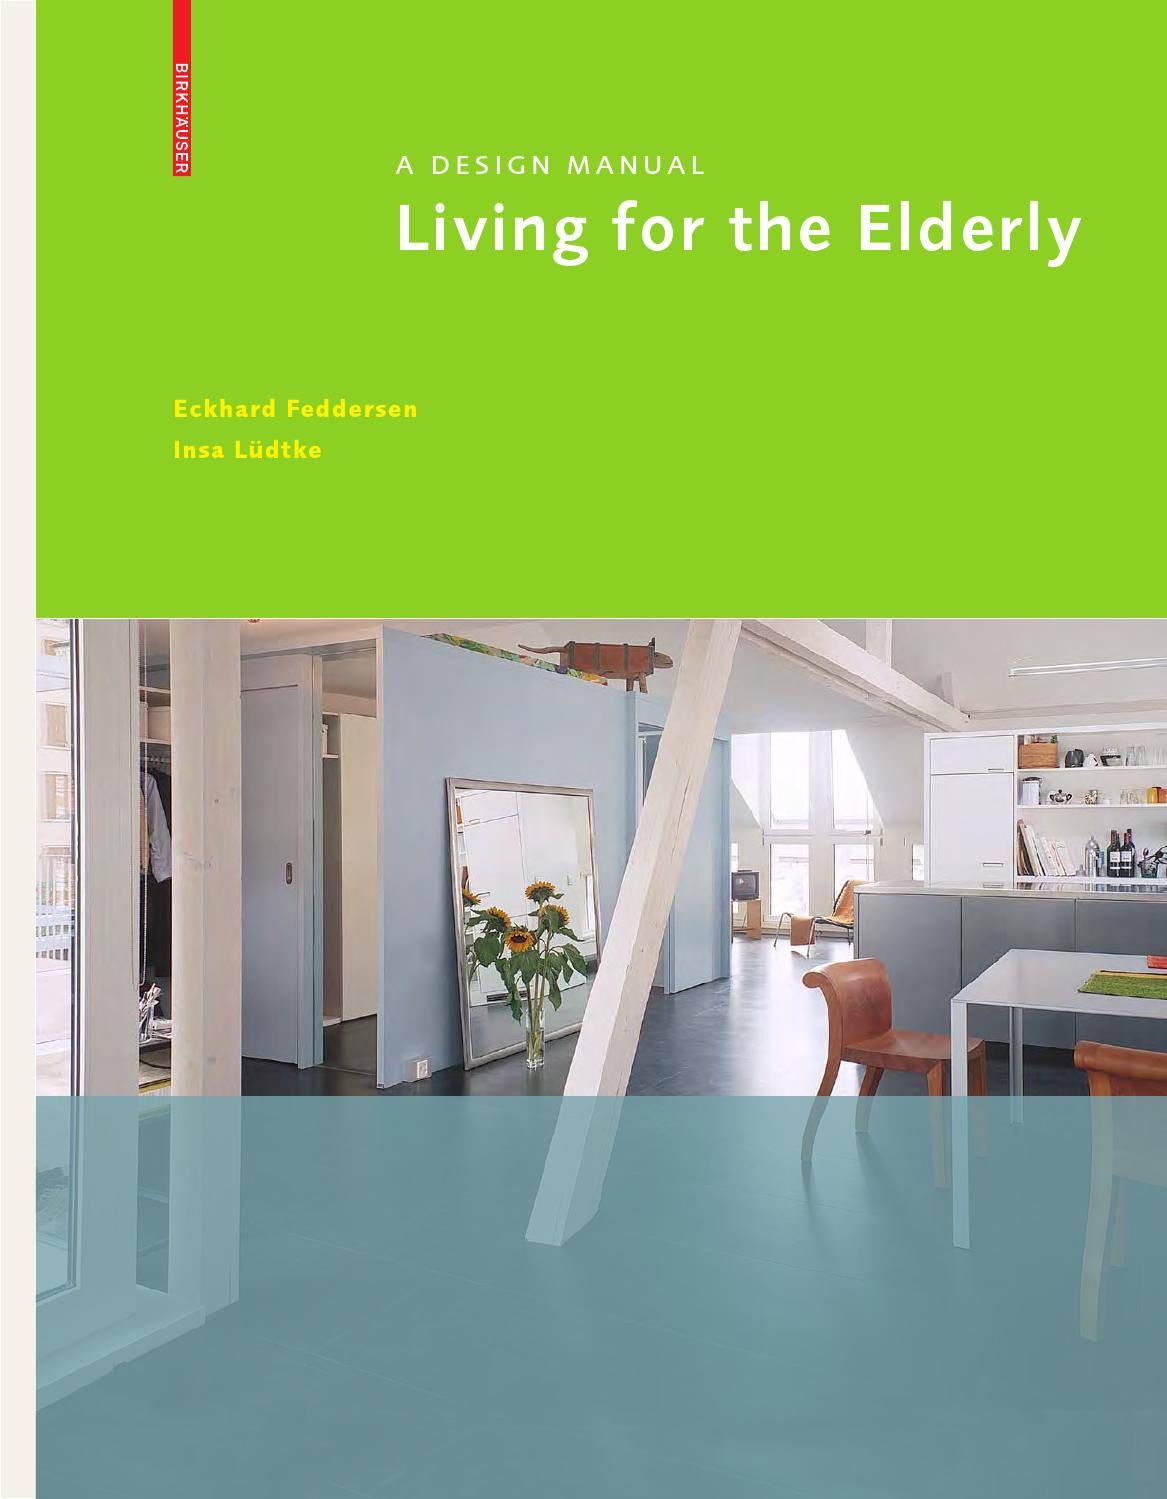 Living for the elderly by birkhäuser issuu